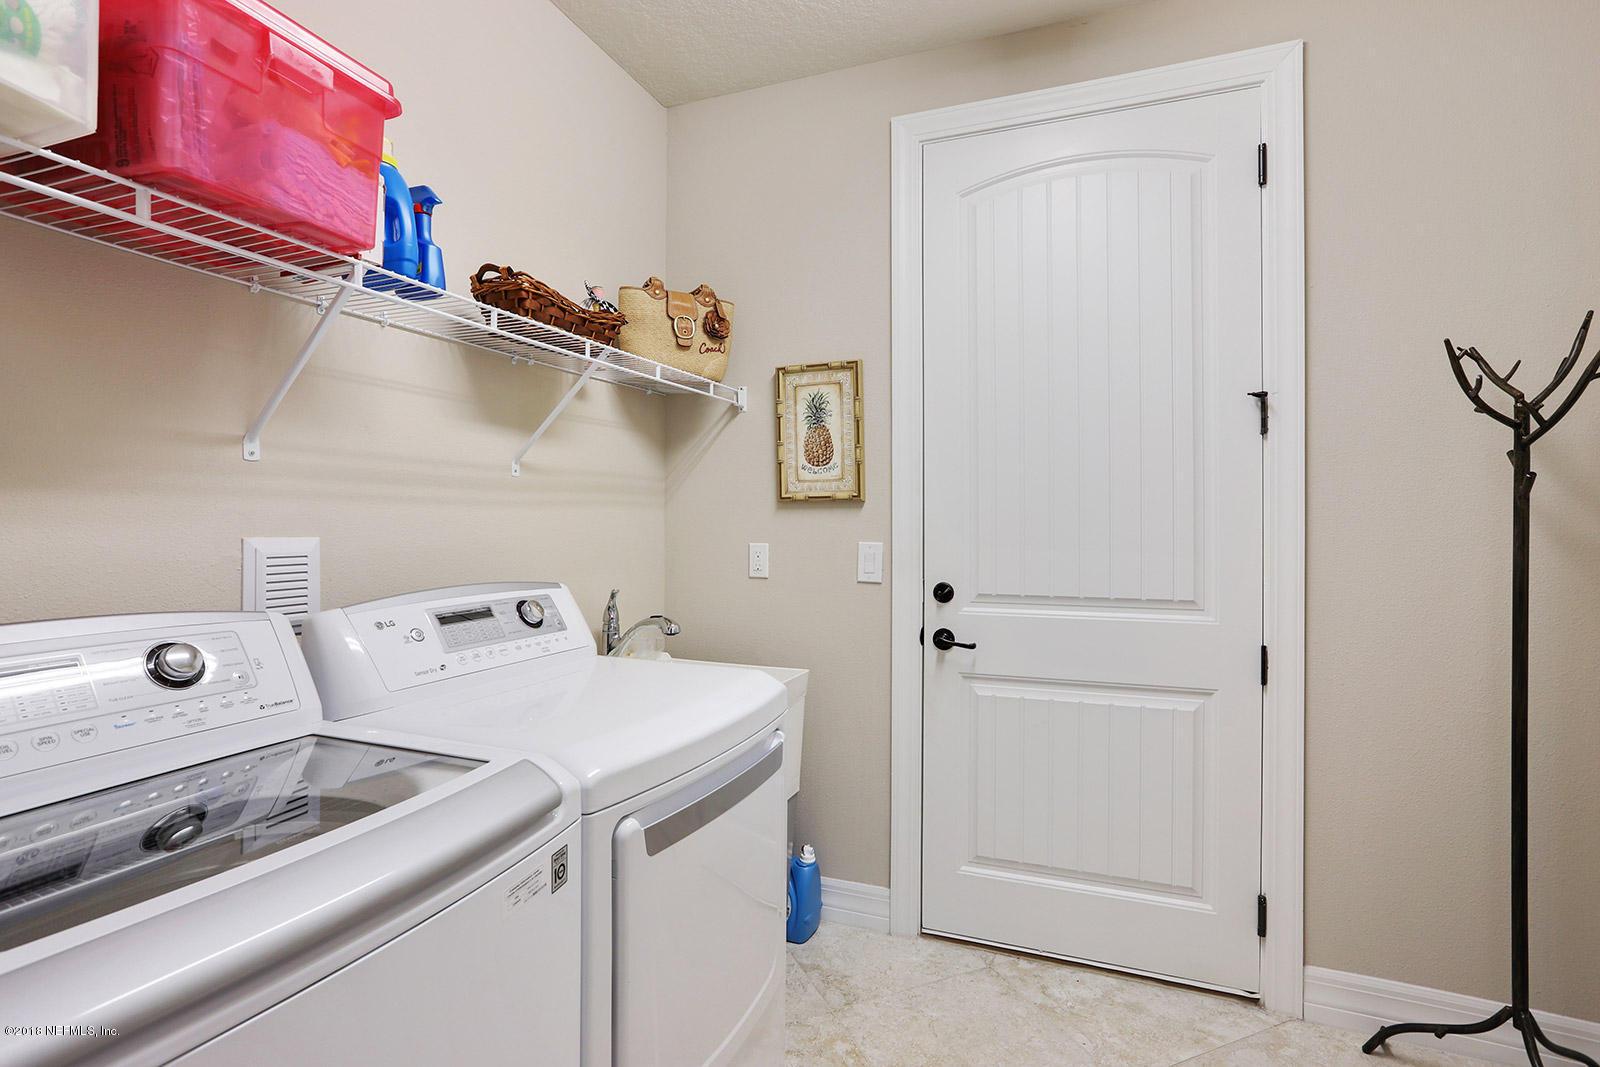 88 MEDJOOL, PONTE VEDRA, FLORIDA 32081, 3 Bedrooms Bedrooms, ,3 BathroomsBathrooms,Residential - single family,For sale,MEDJOOL,934792